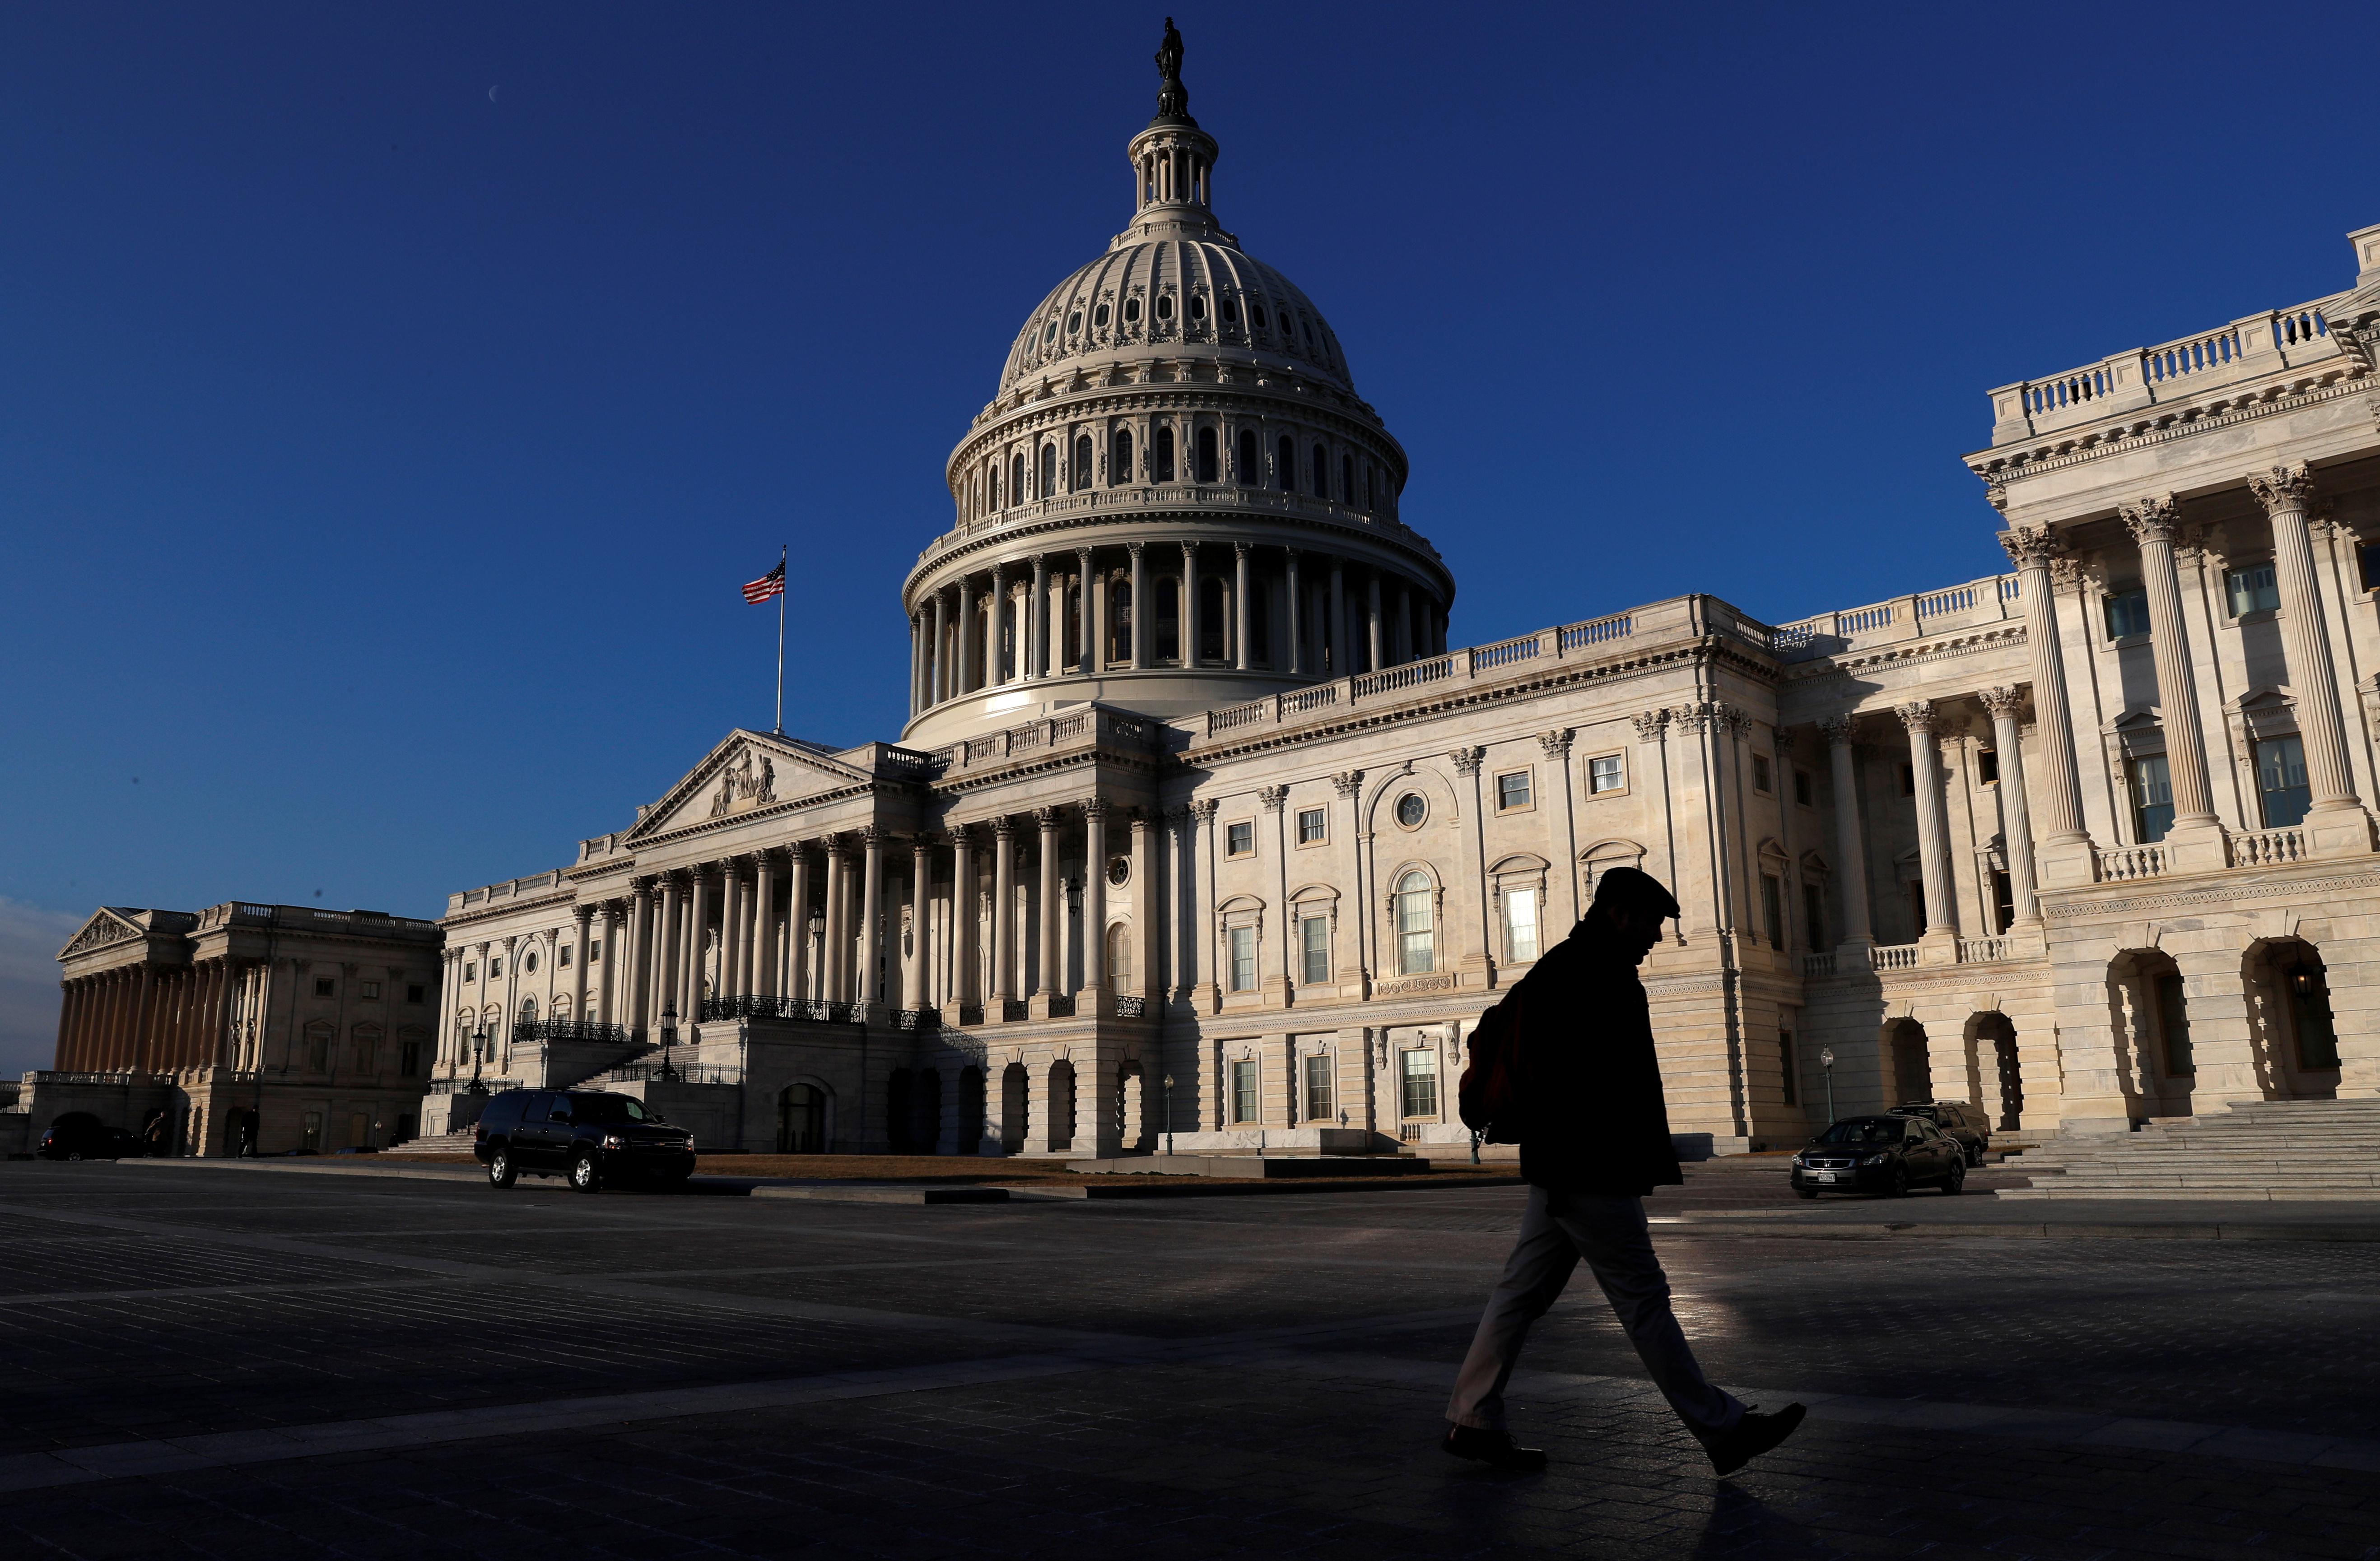 People walk by the U.S. Capitol building in Washington, U.S., February 8, 2018. REUTERS/ Leah Millis - RC13737E70C0